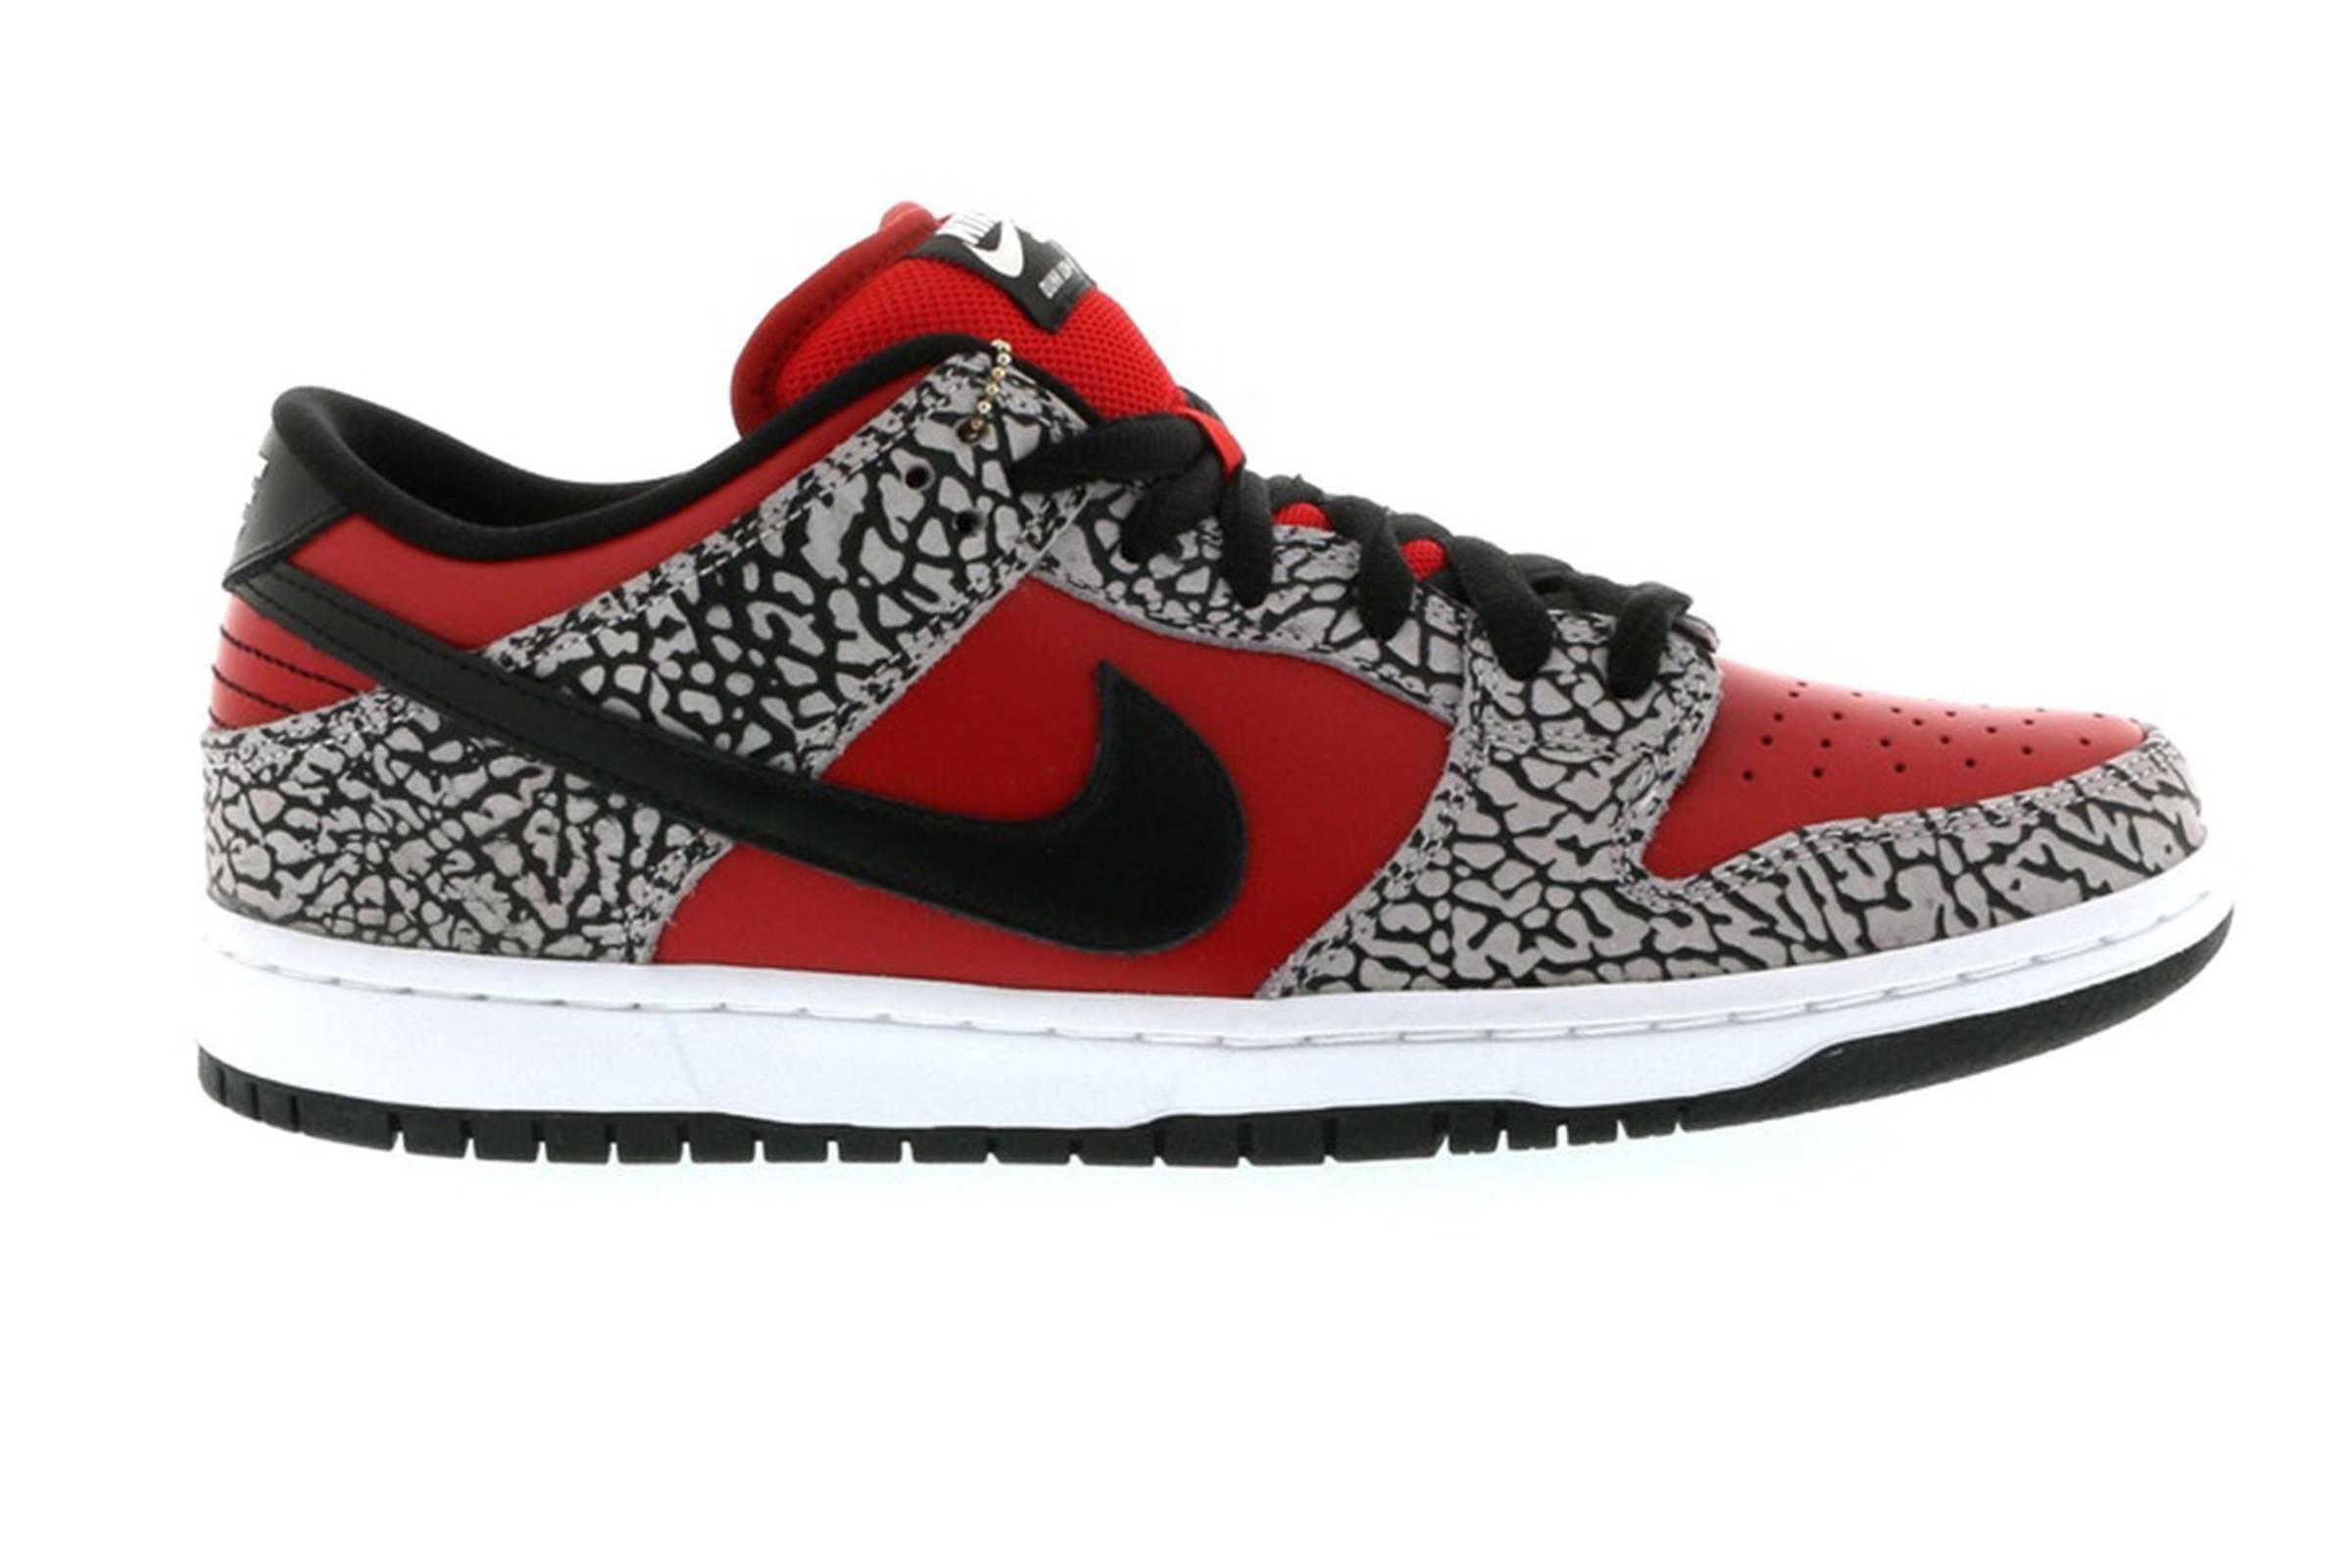 Supreme x Nike SB Cement Dunk Low